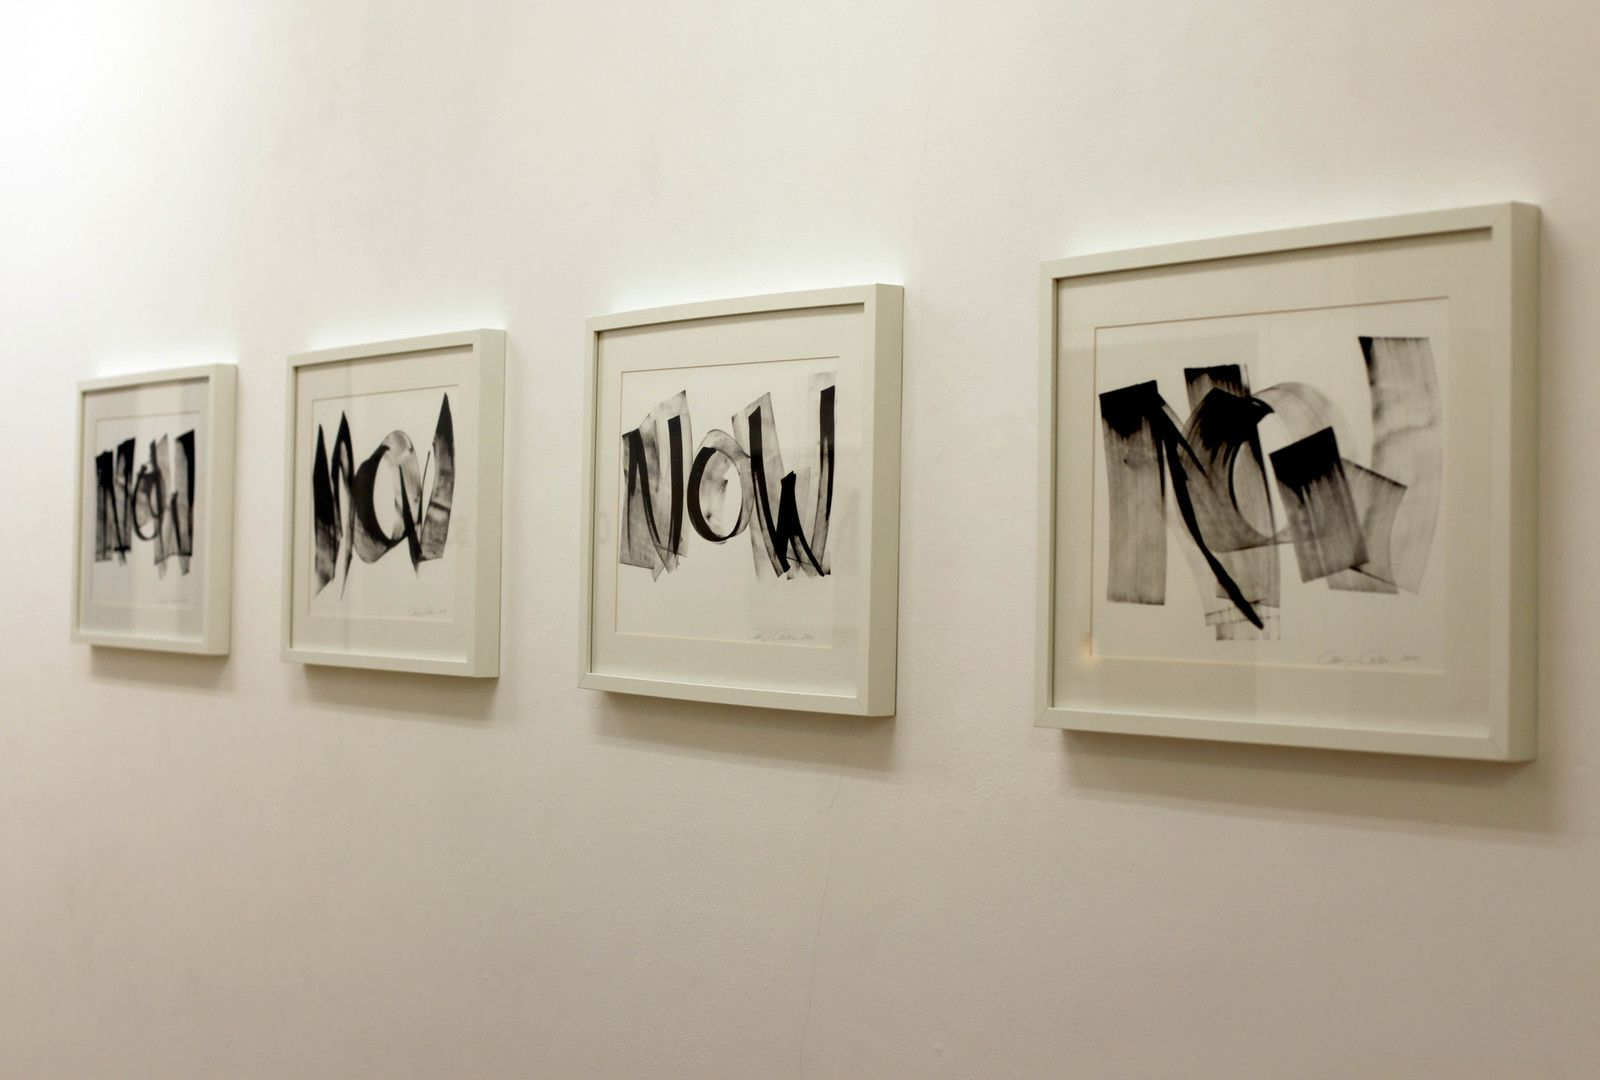 """NOW II, III, V, IV"", 2014 de Carolyn CARLSON - Courtesy de l'artiste et de la Galerie Isabelle Gounod © Photo Éric Simon"